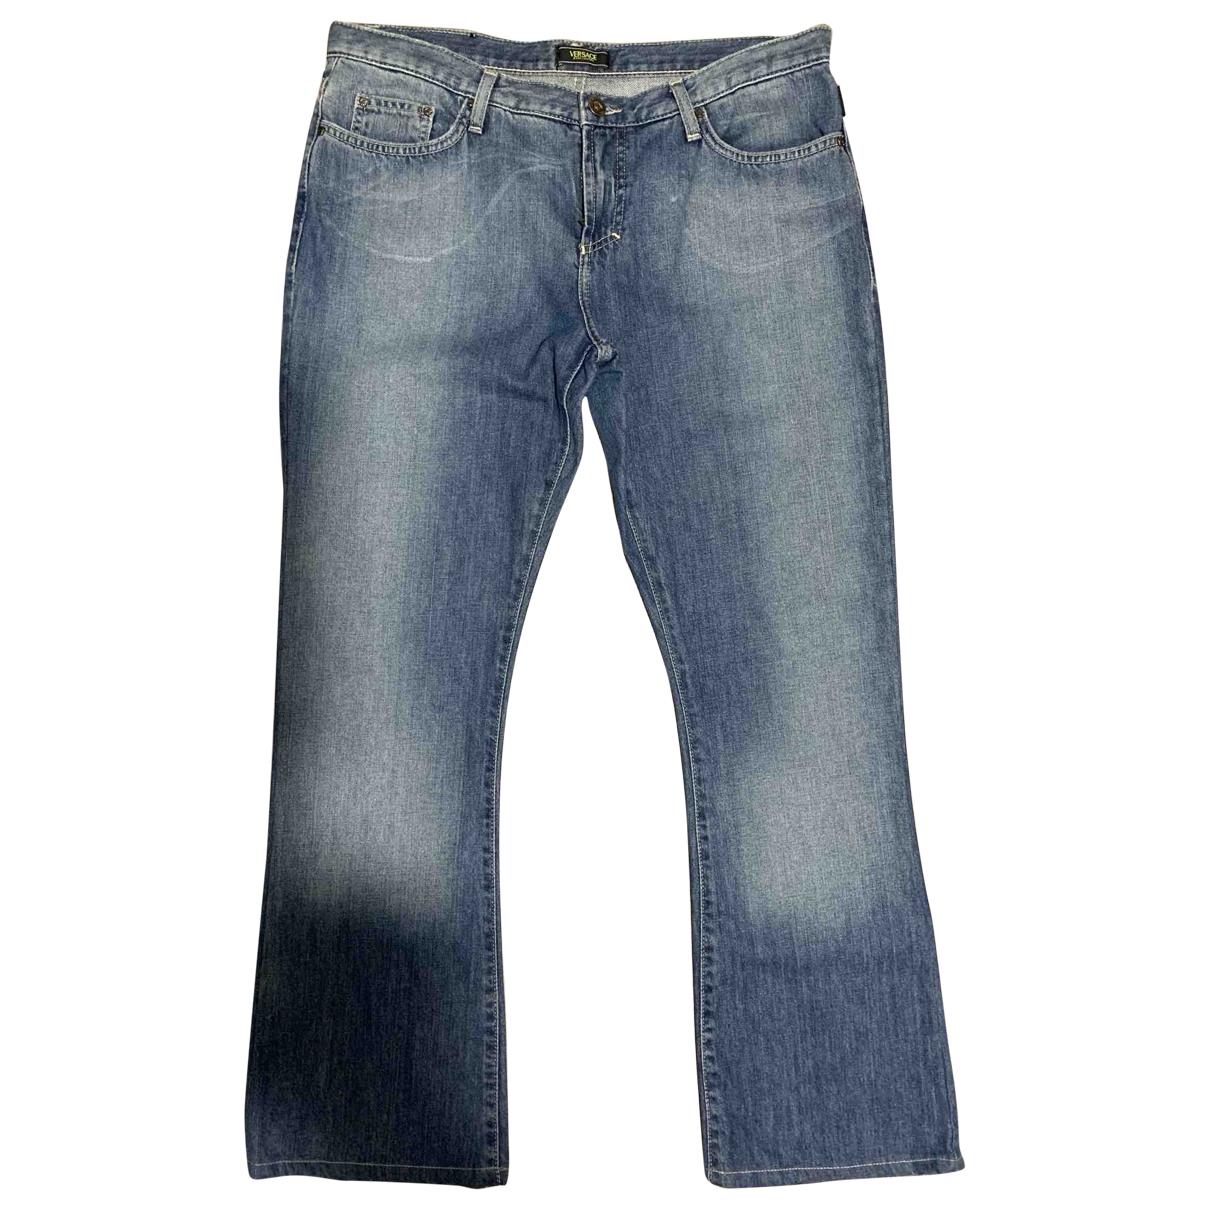 Versace Jeans \N Blue Denim - Jeans Jeans for Women 31 US